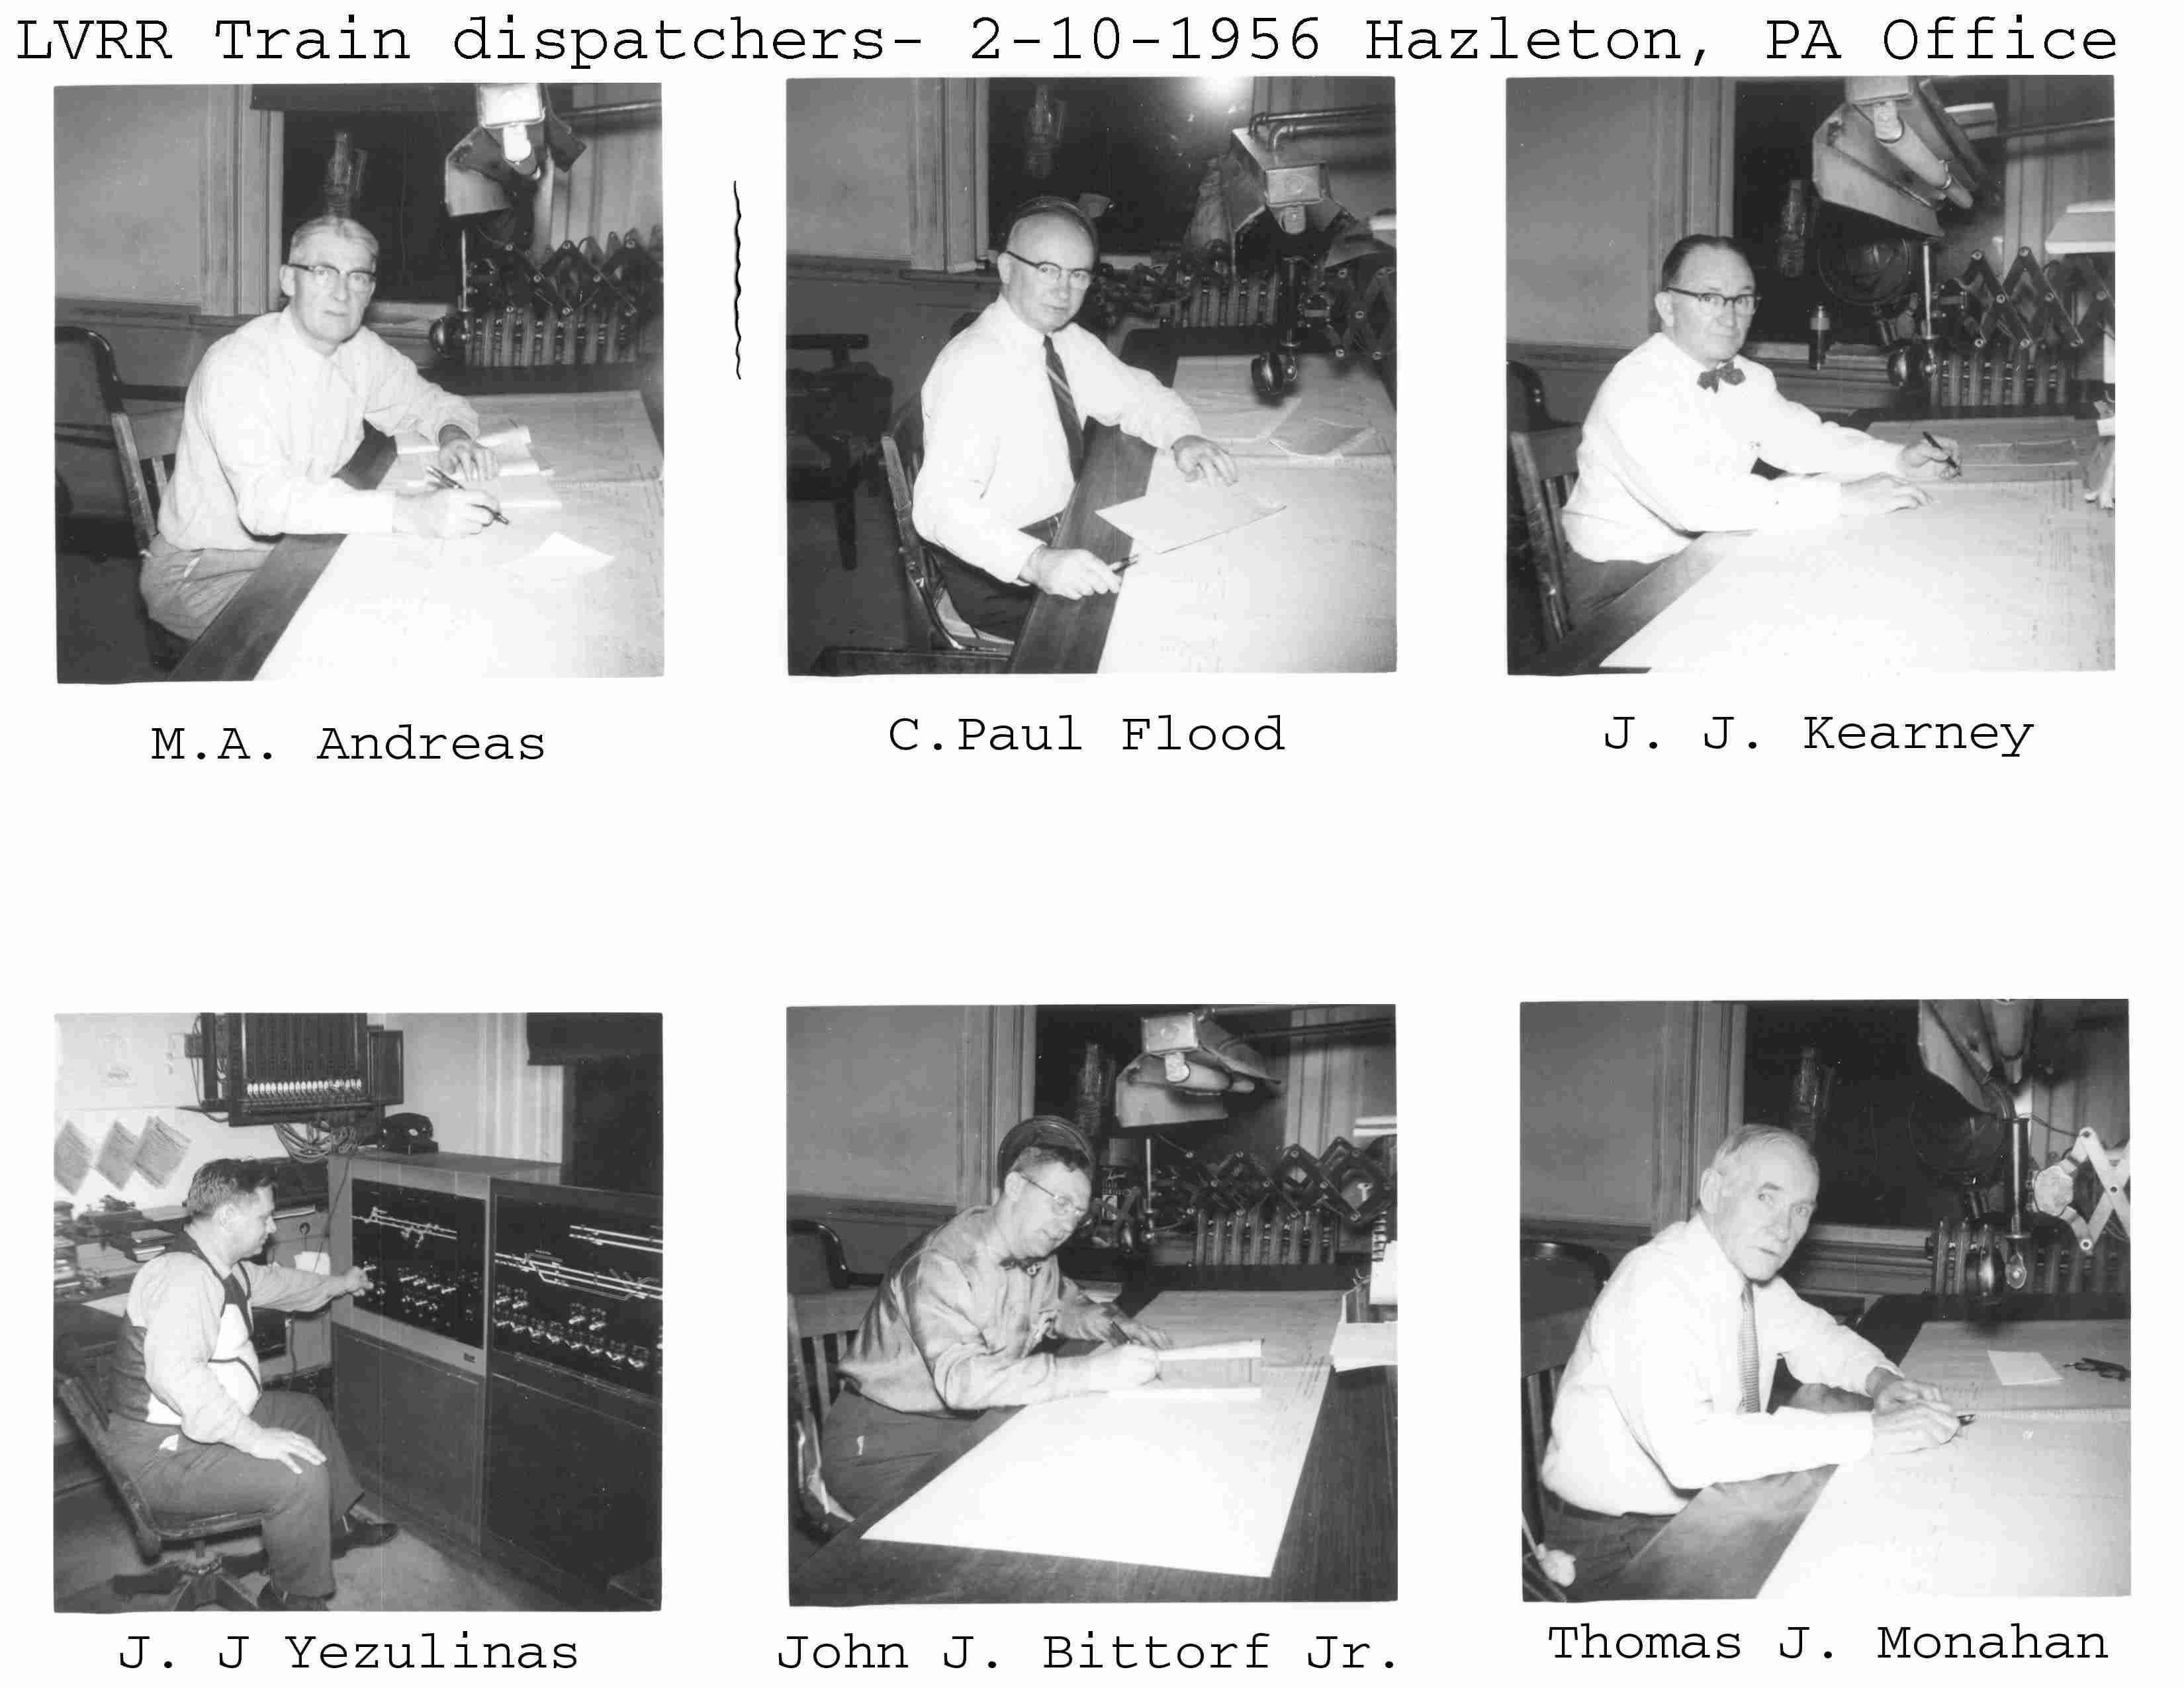 Hazleton, Pa. 1956